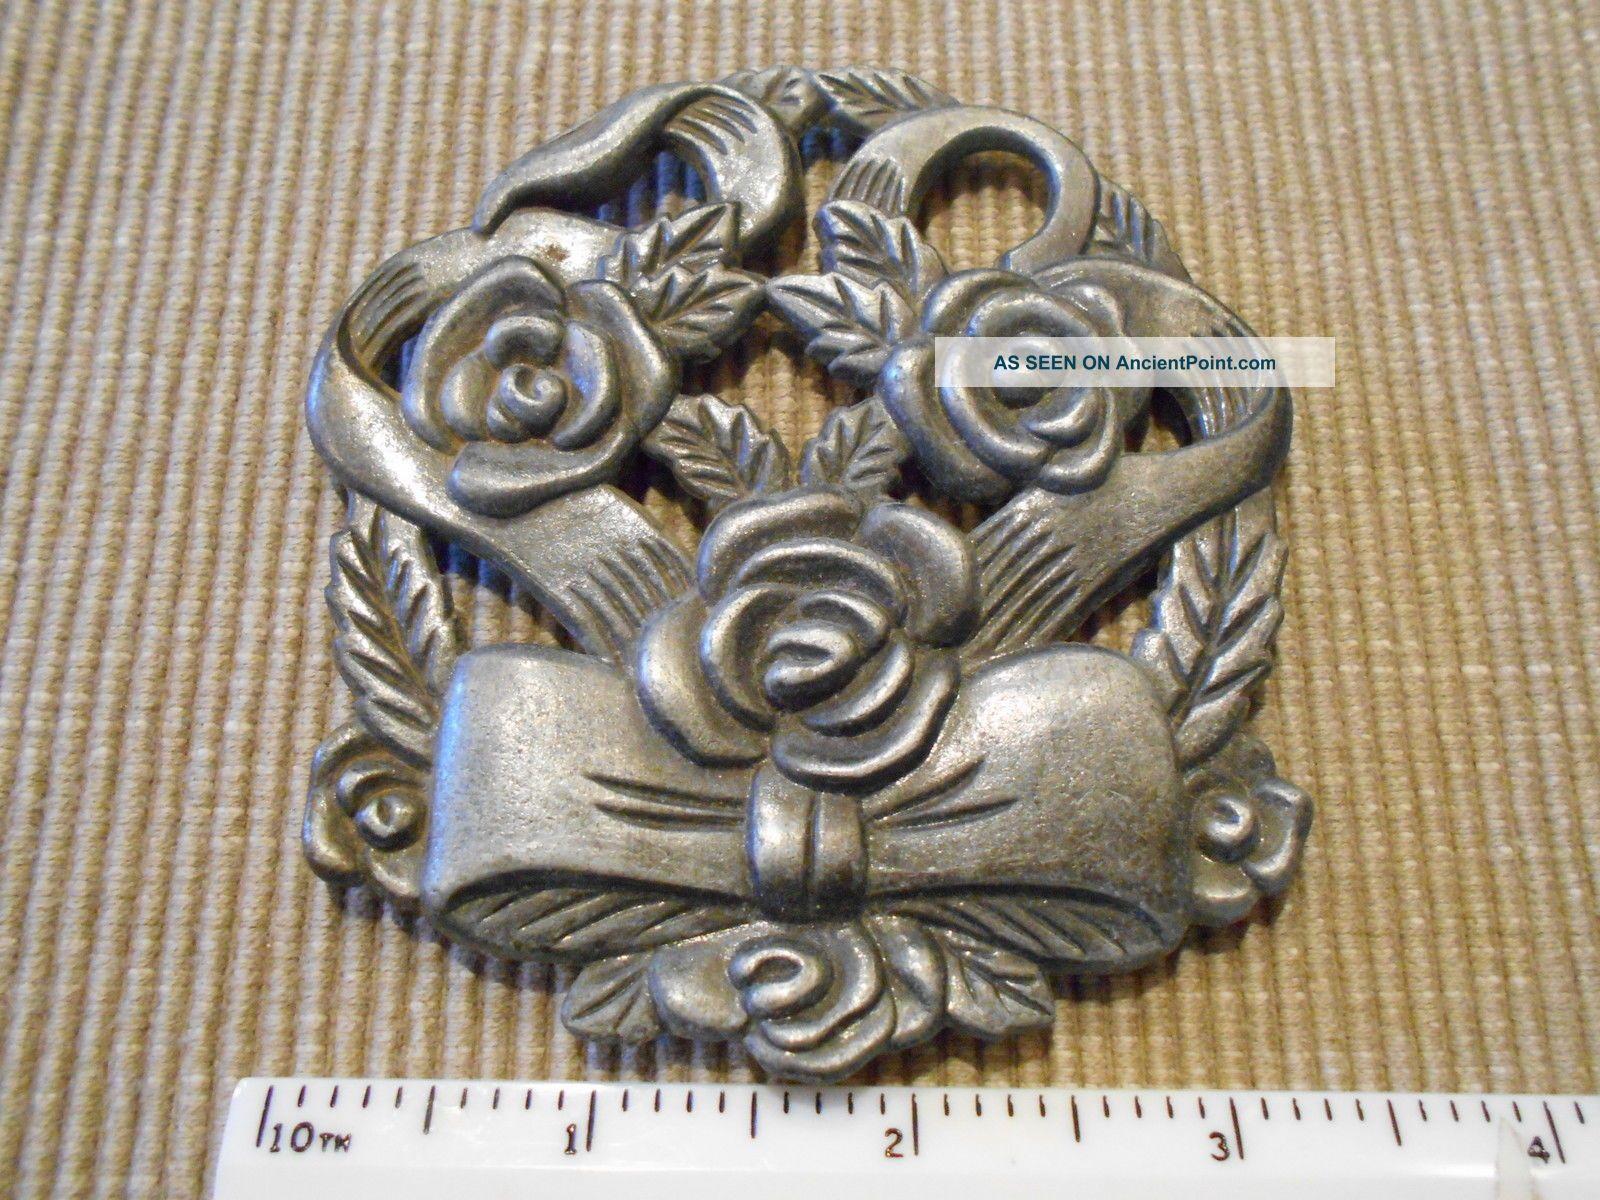 Antique Metal Trivet Floral Flowers With Bow Ribbon Design Trivets photo